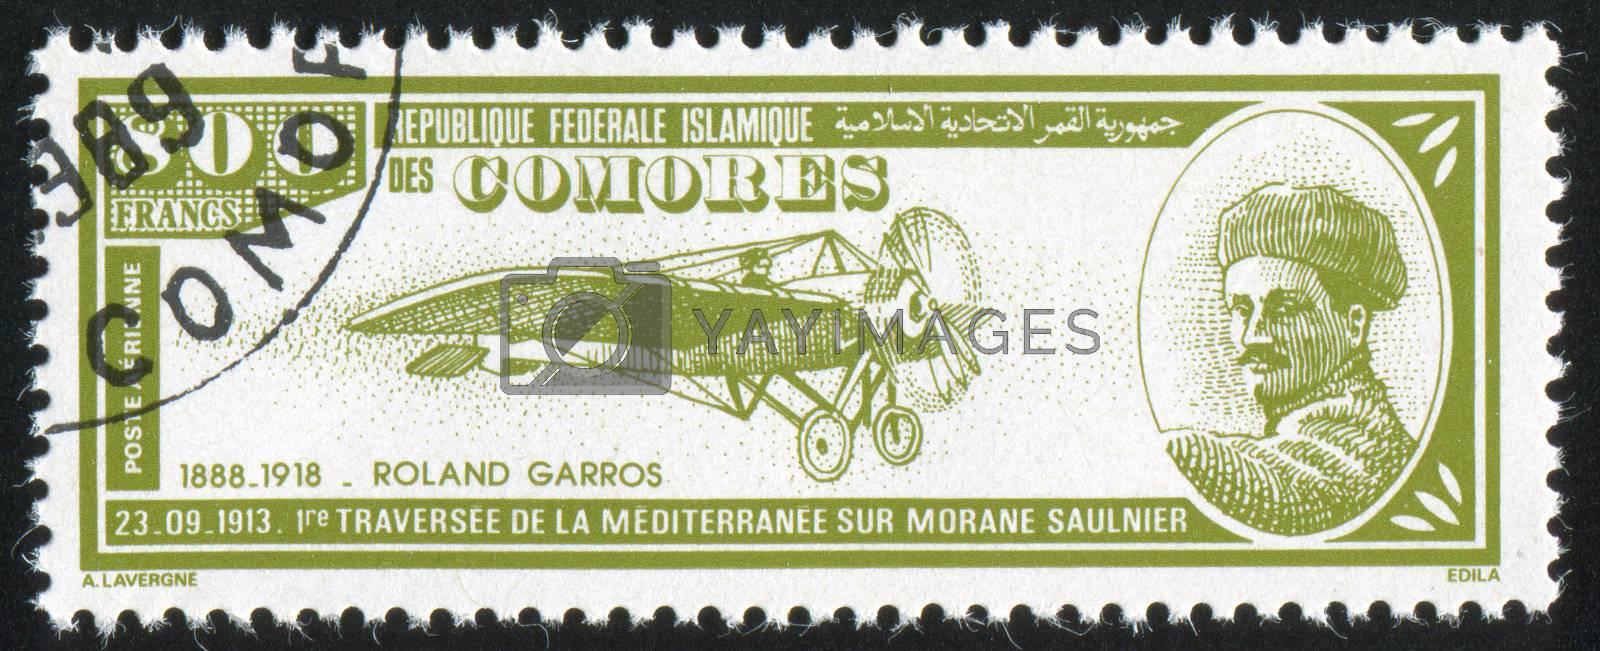 COMORO ISLANDS - CIRCA 1988: stamp printed by Comoro islands, shows airplane and Roland Garros, circa 1988